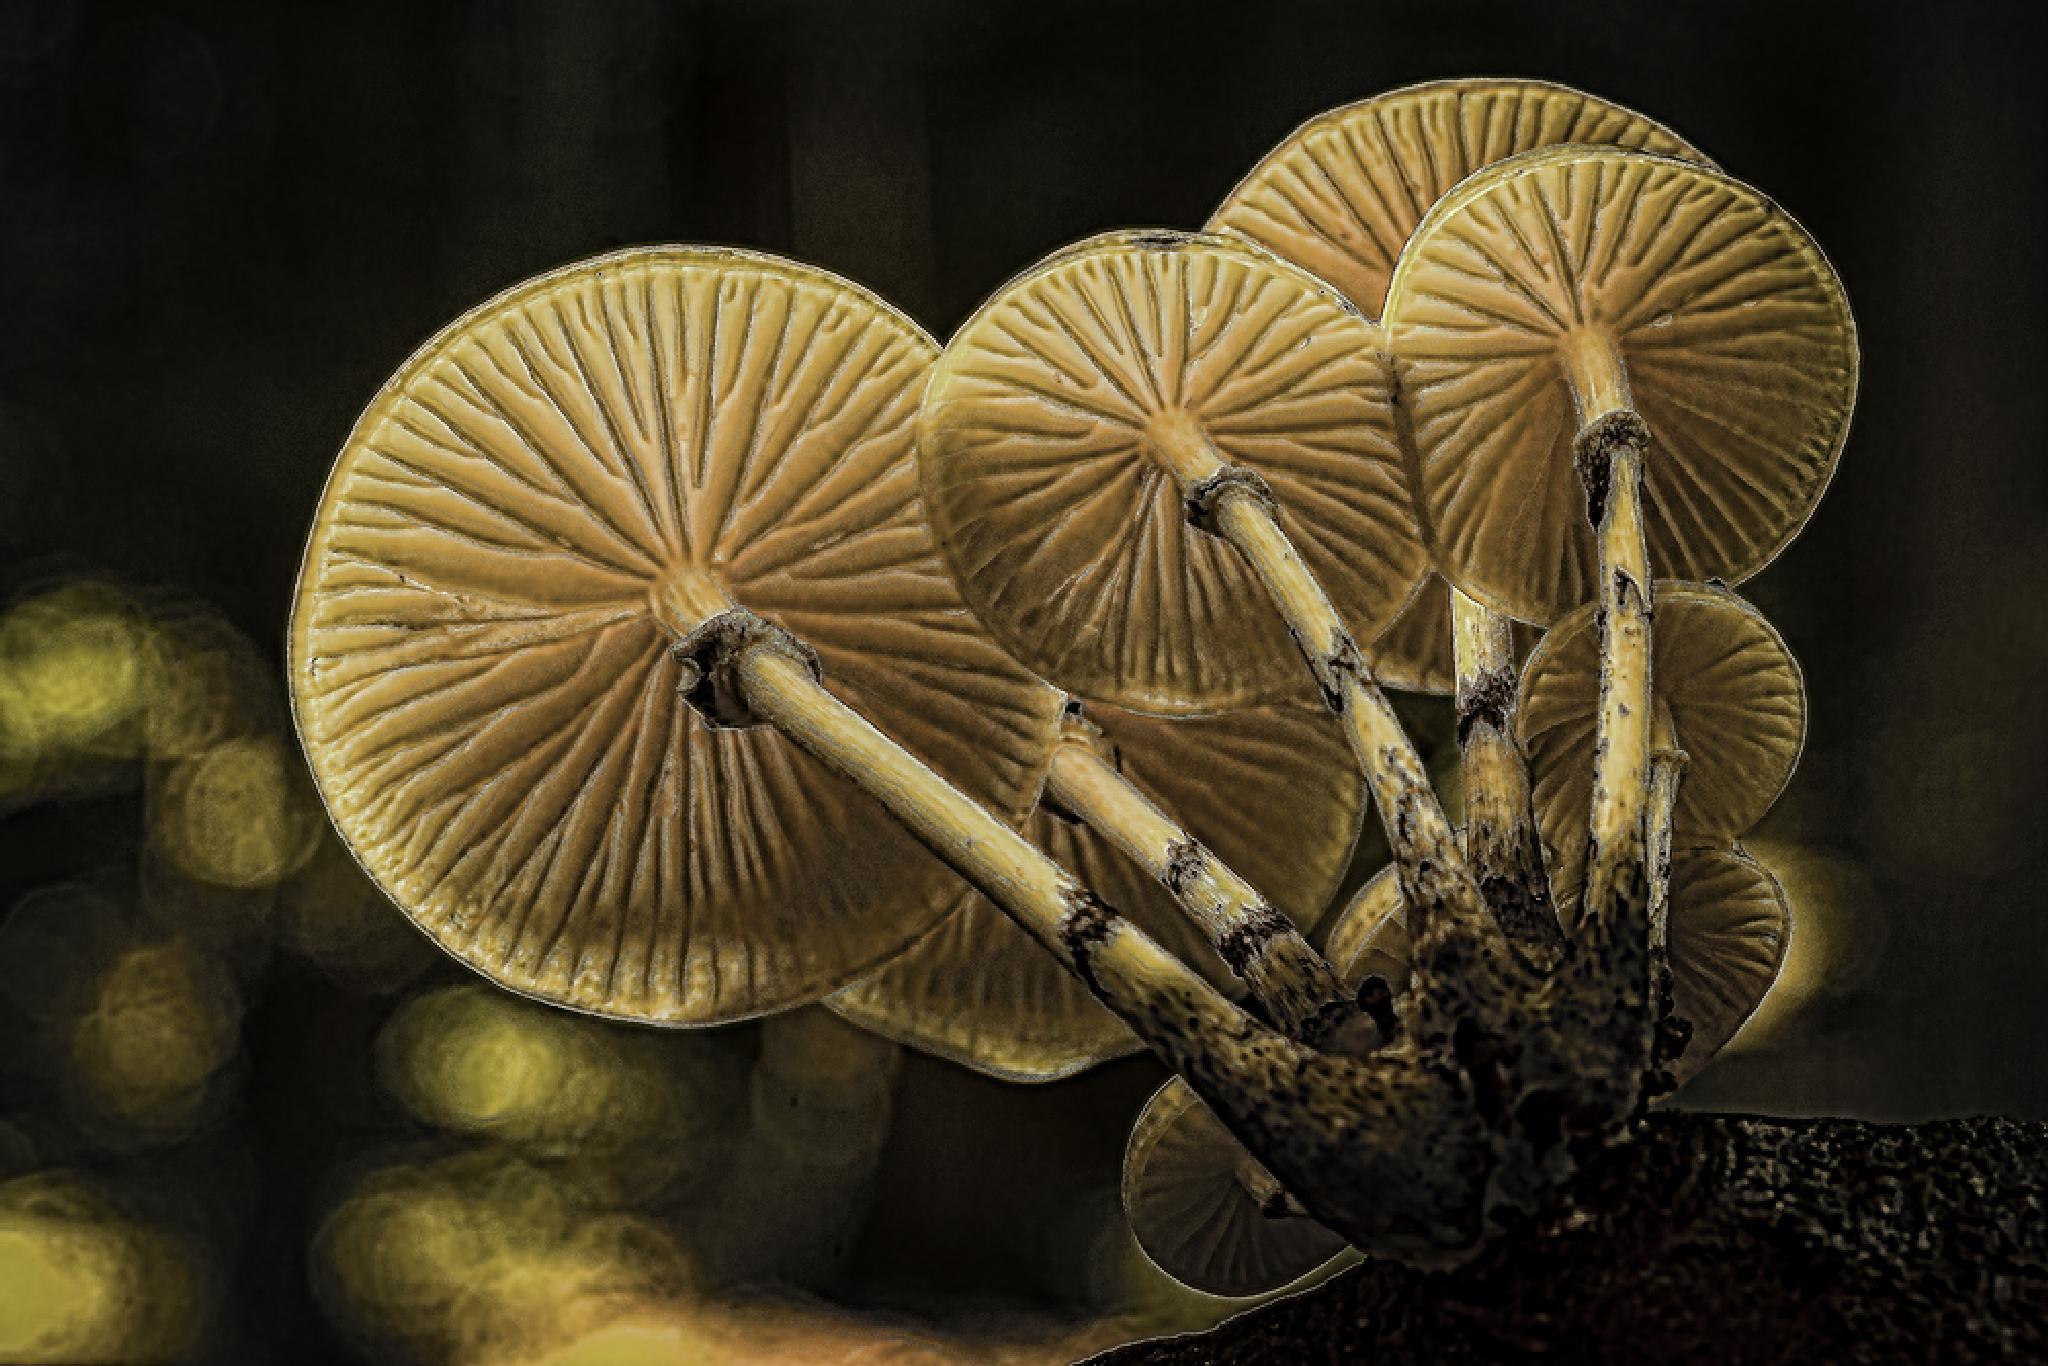 Fungimania by Peter Samuelsson